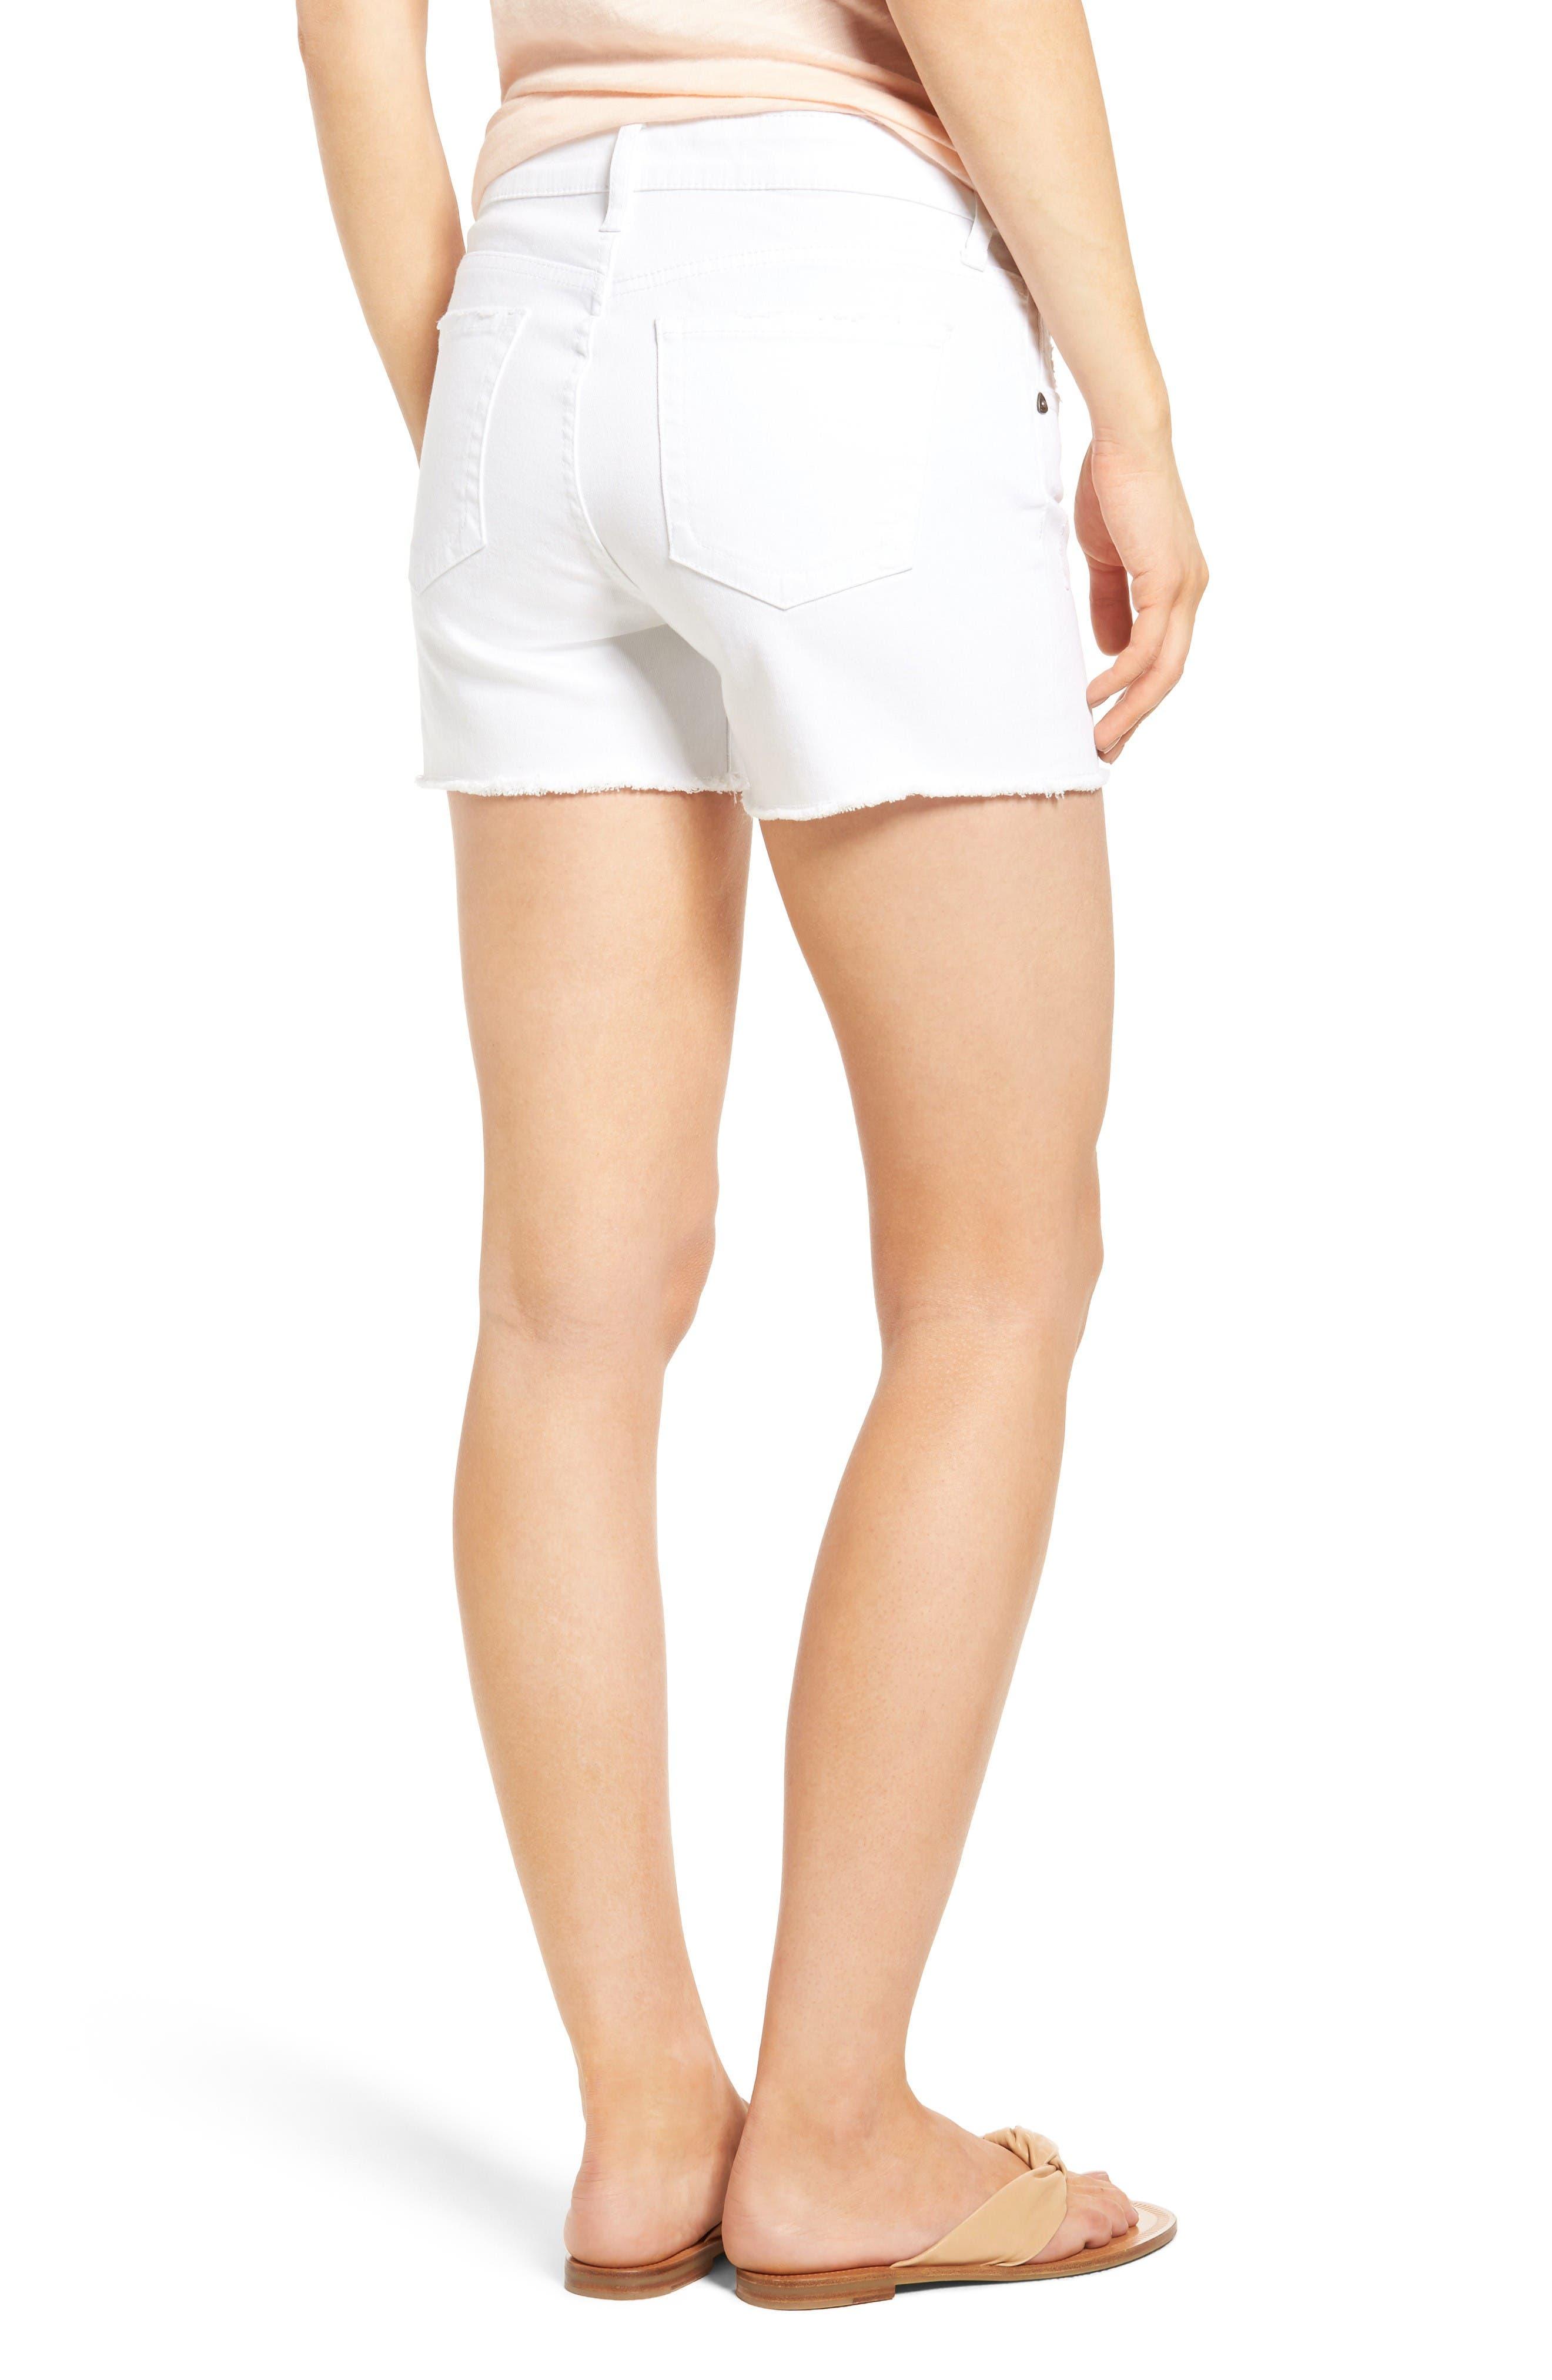 Alternate Image 2  - KUT from the Kloth Gidget Denim Shorts (Optic White)